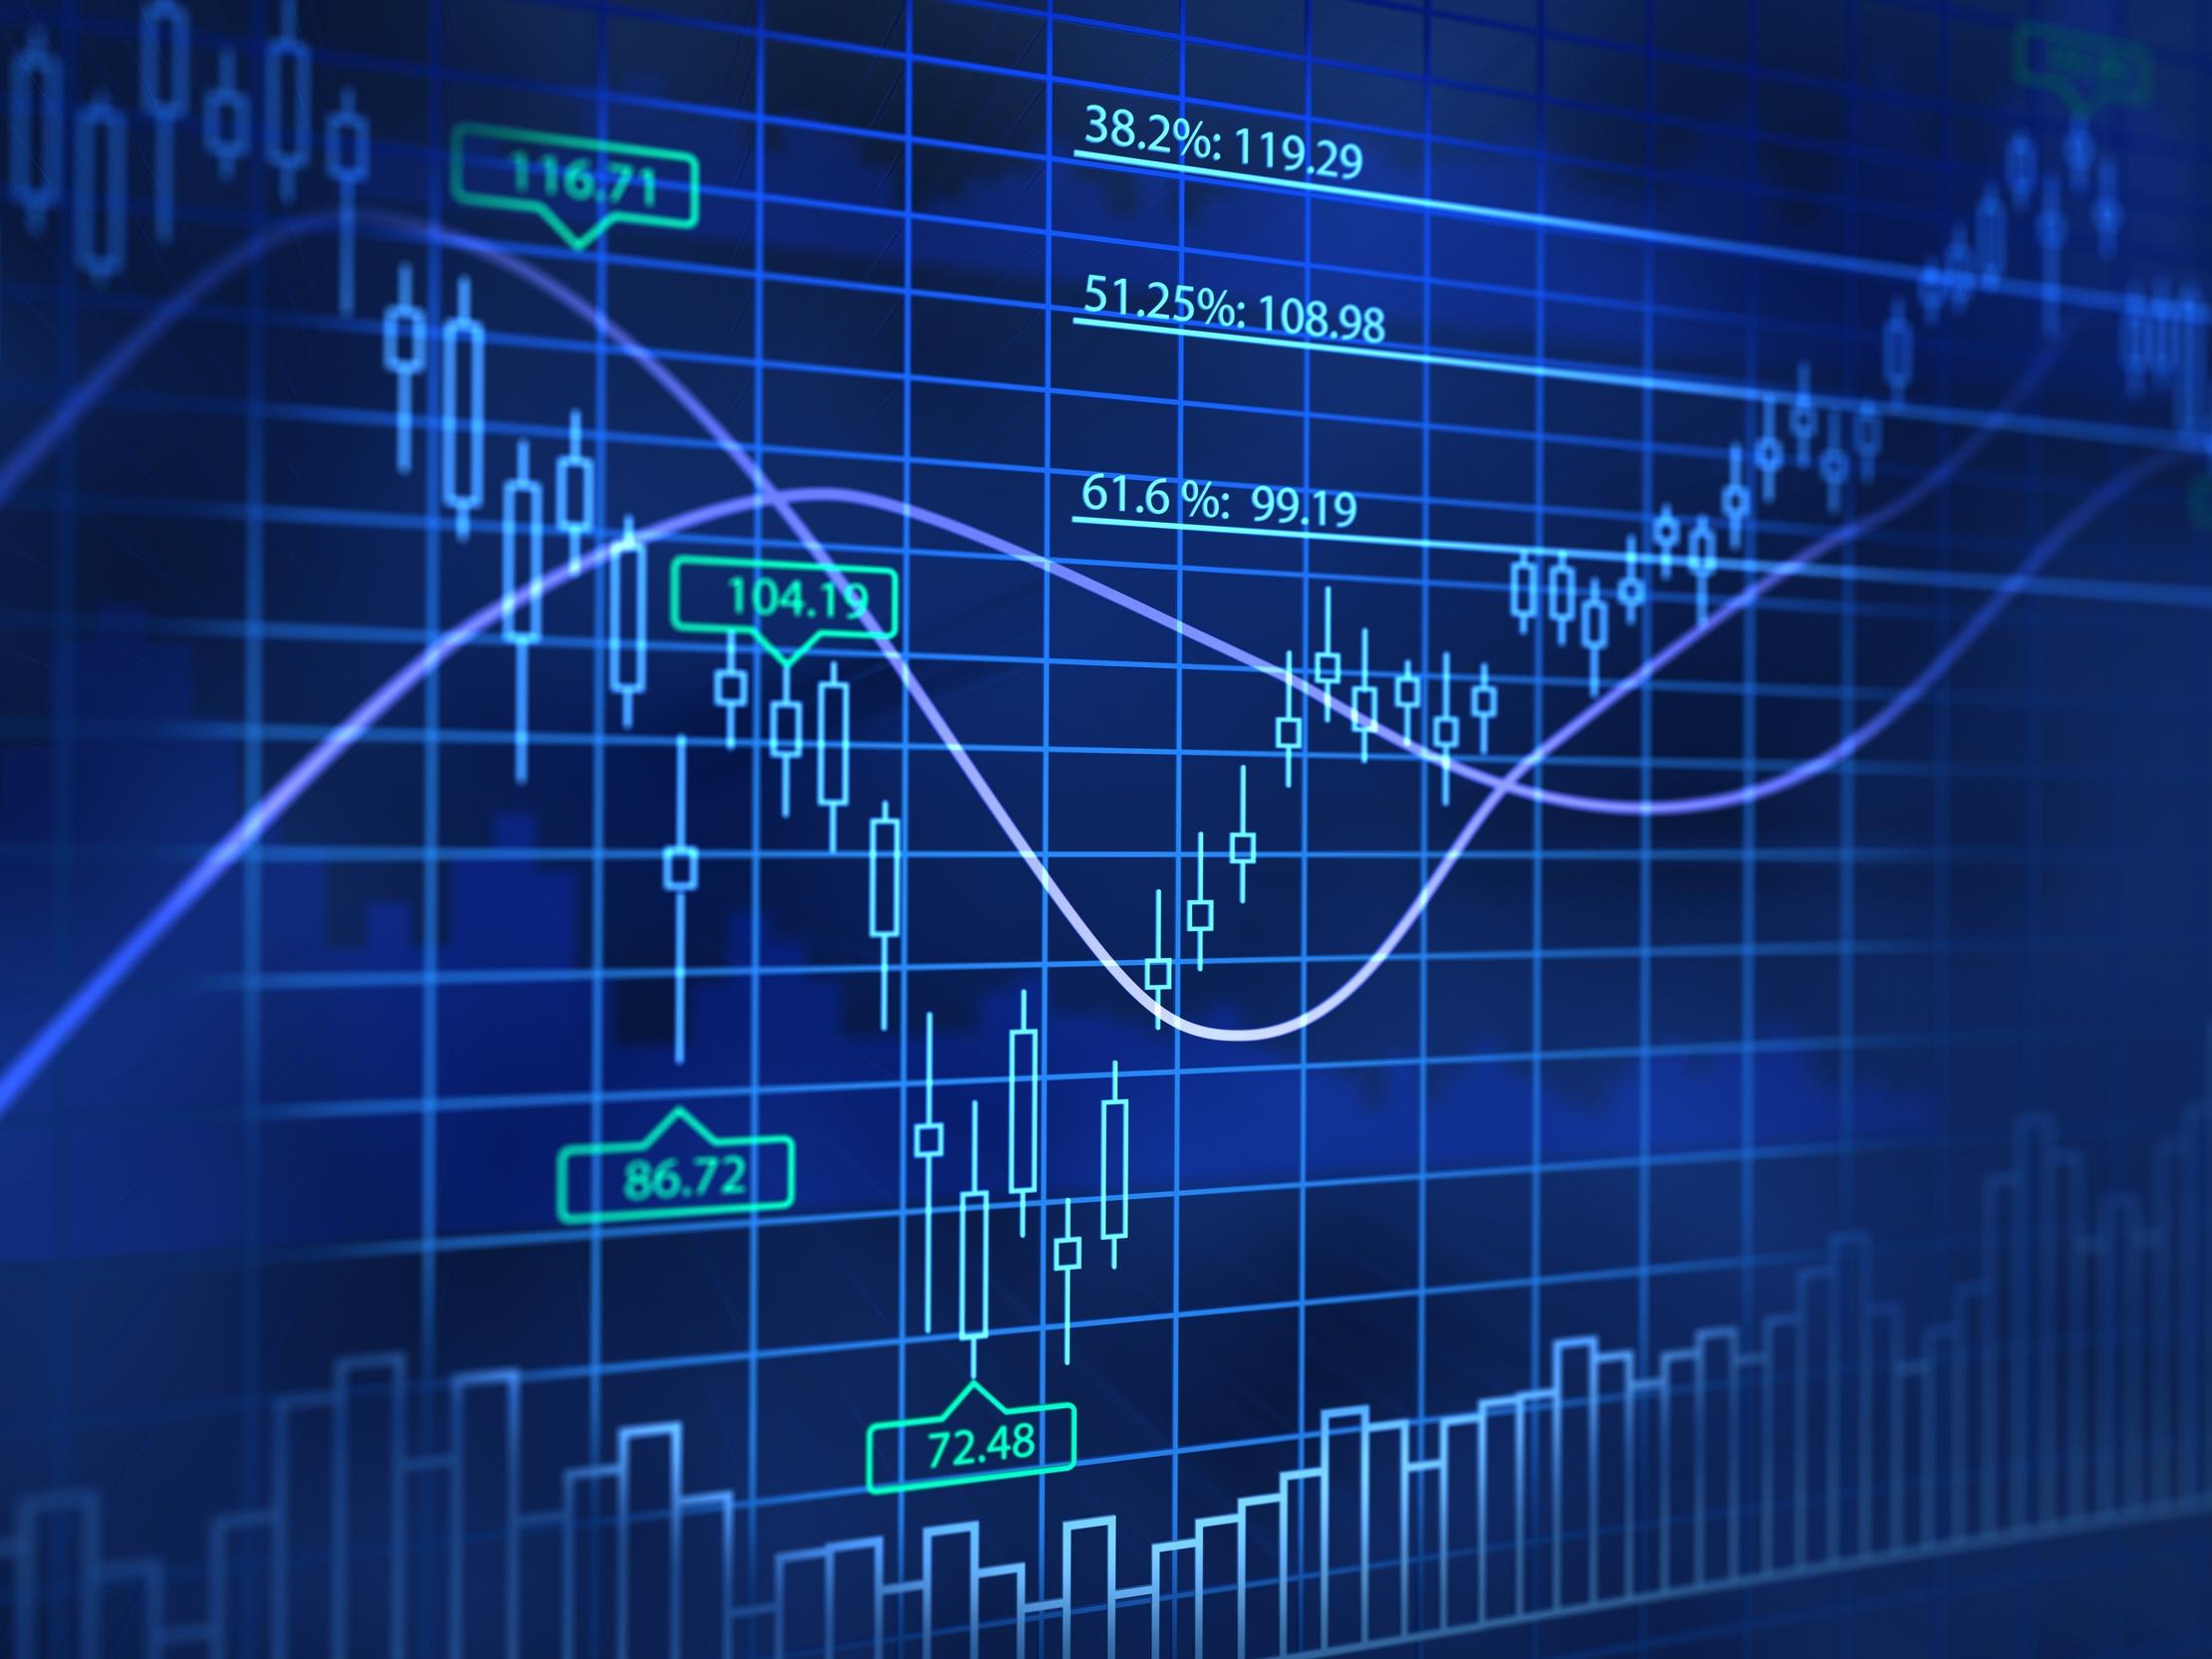 Суть валютно-биржевого трейдинга